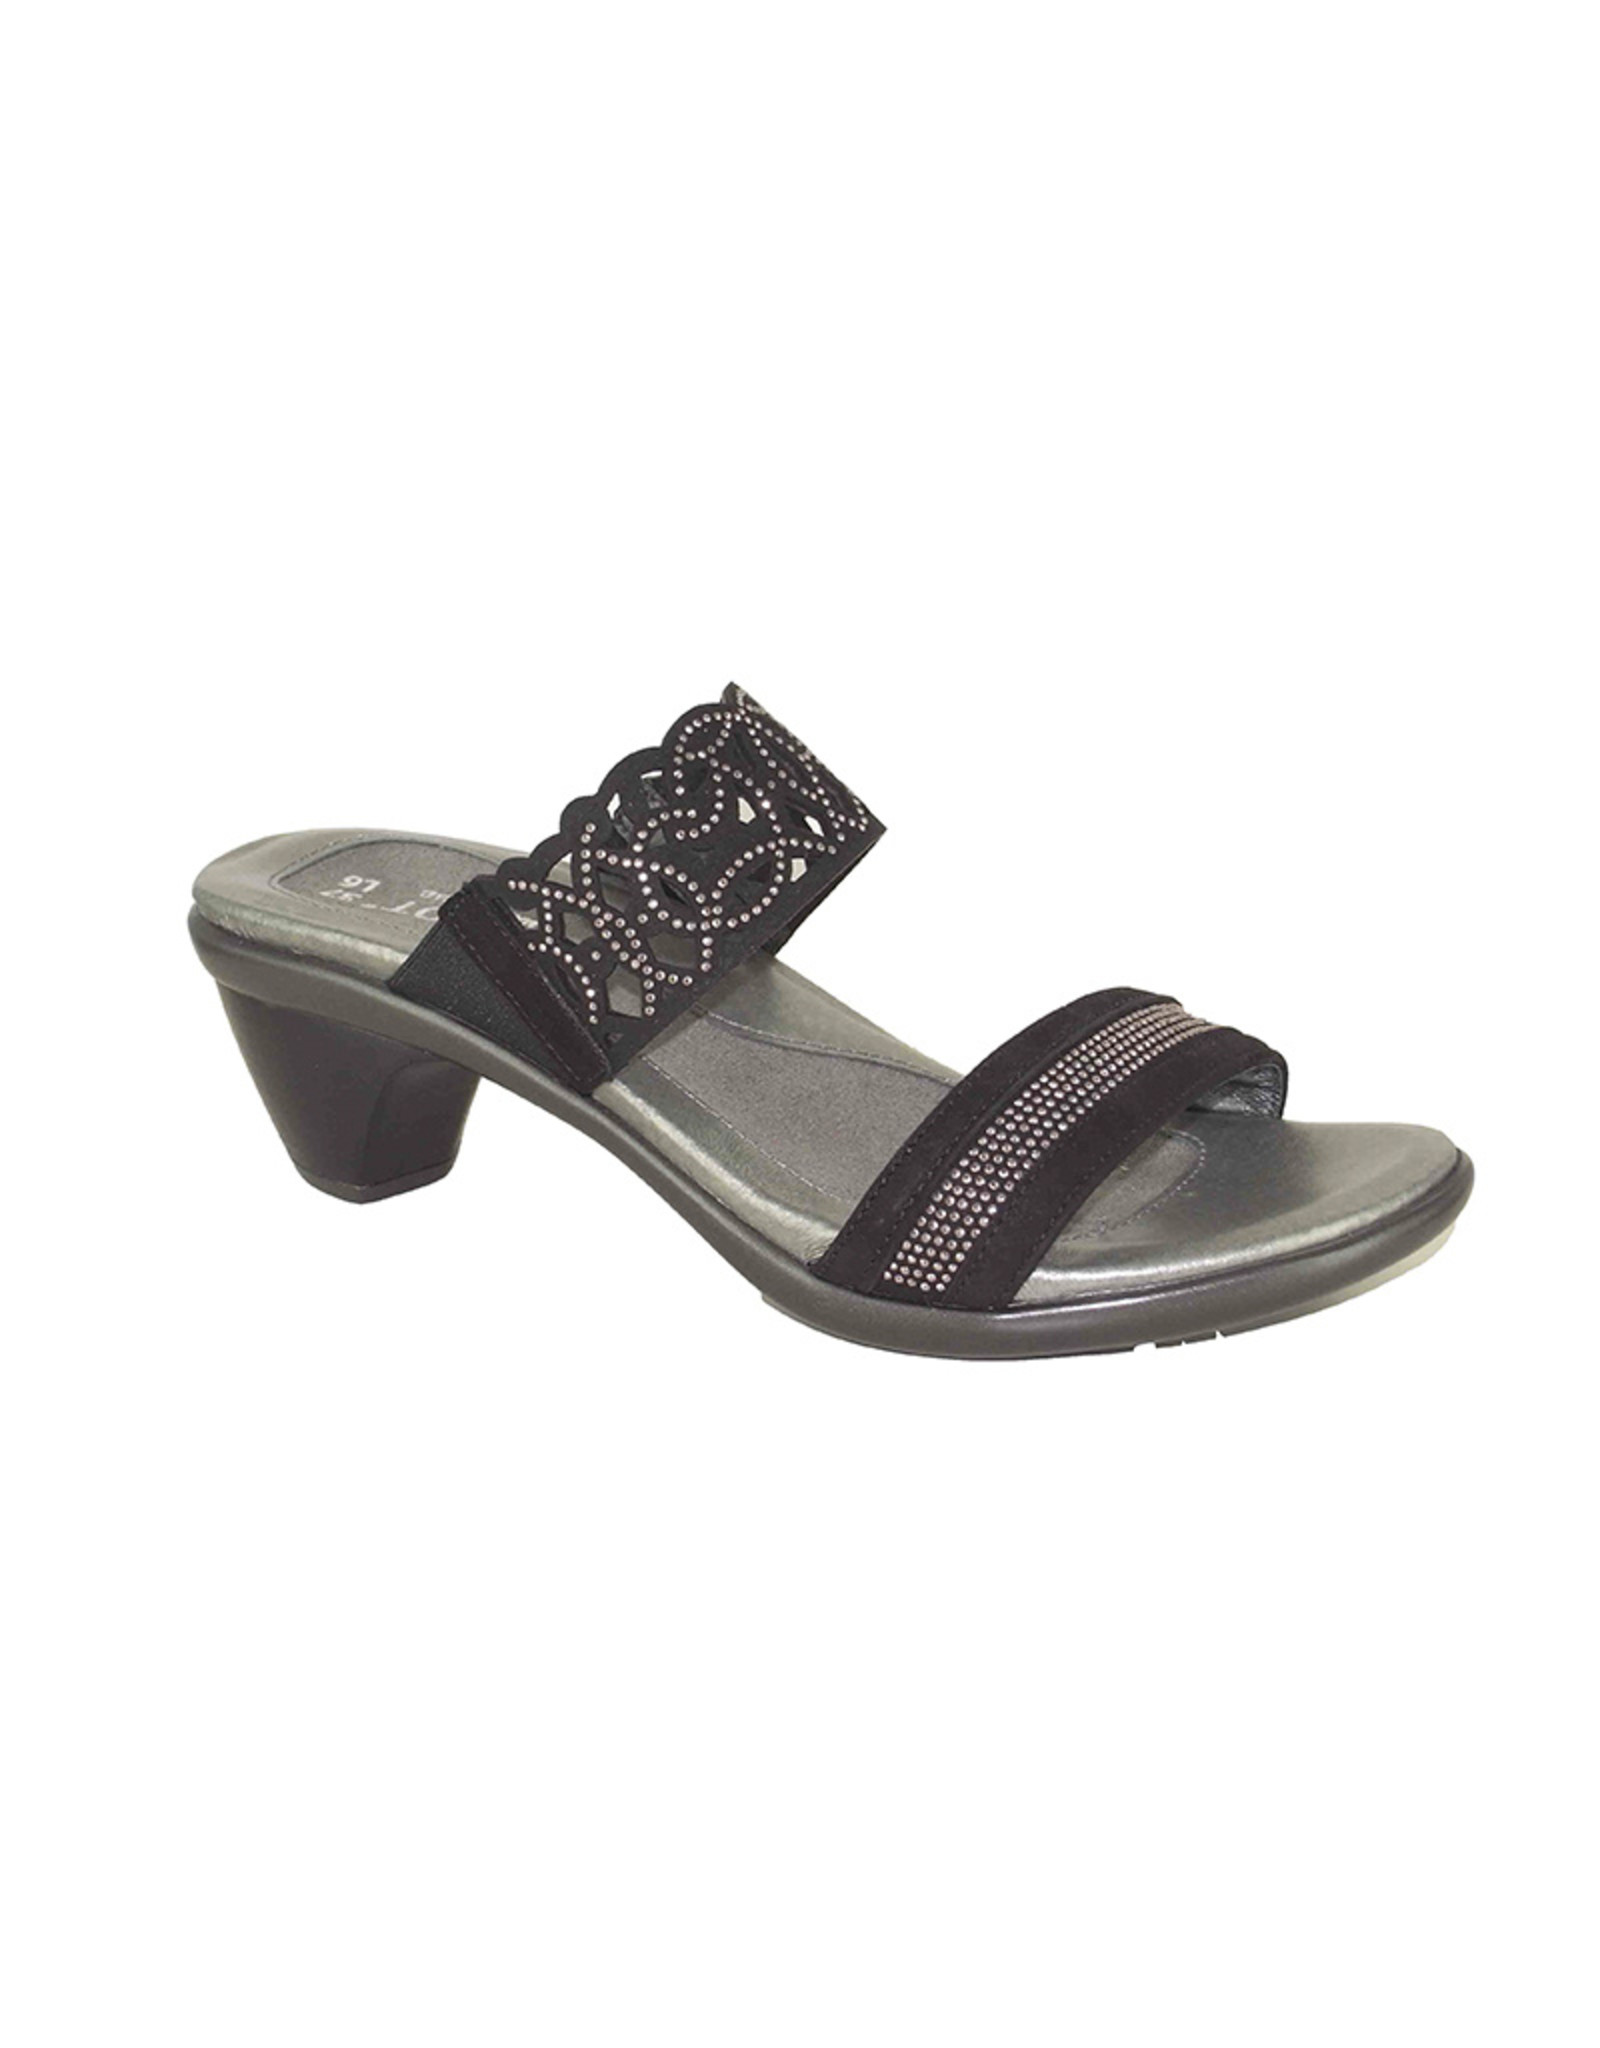 Naot Footwear Contempo in Black Velvet